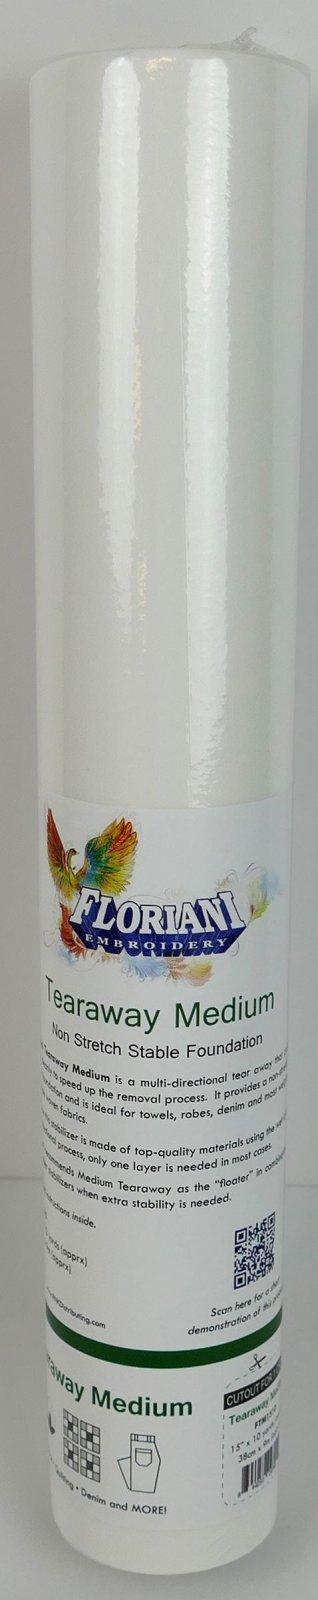 Tearaway Medium : Non Stretch Stable Foundation - 15 x 10 yards - Floriani